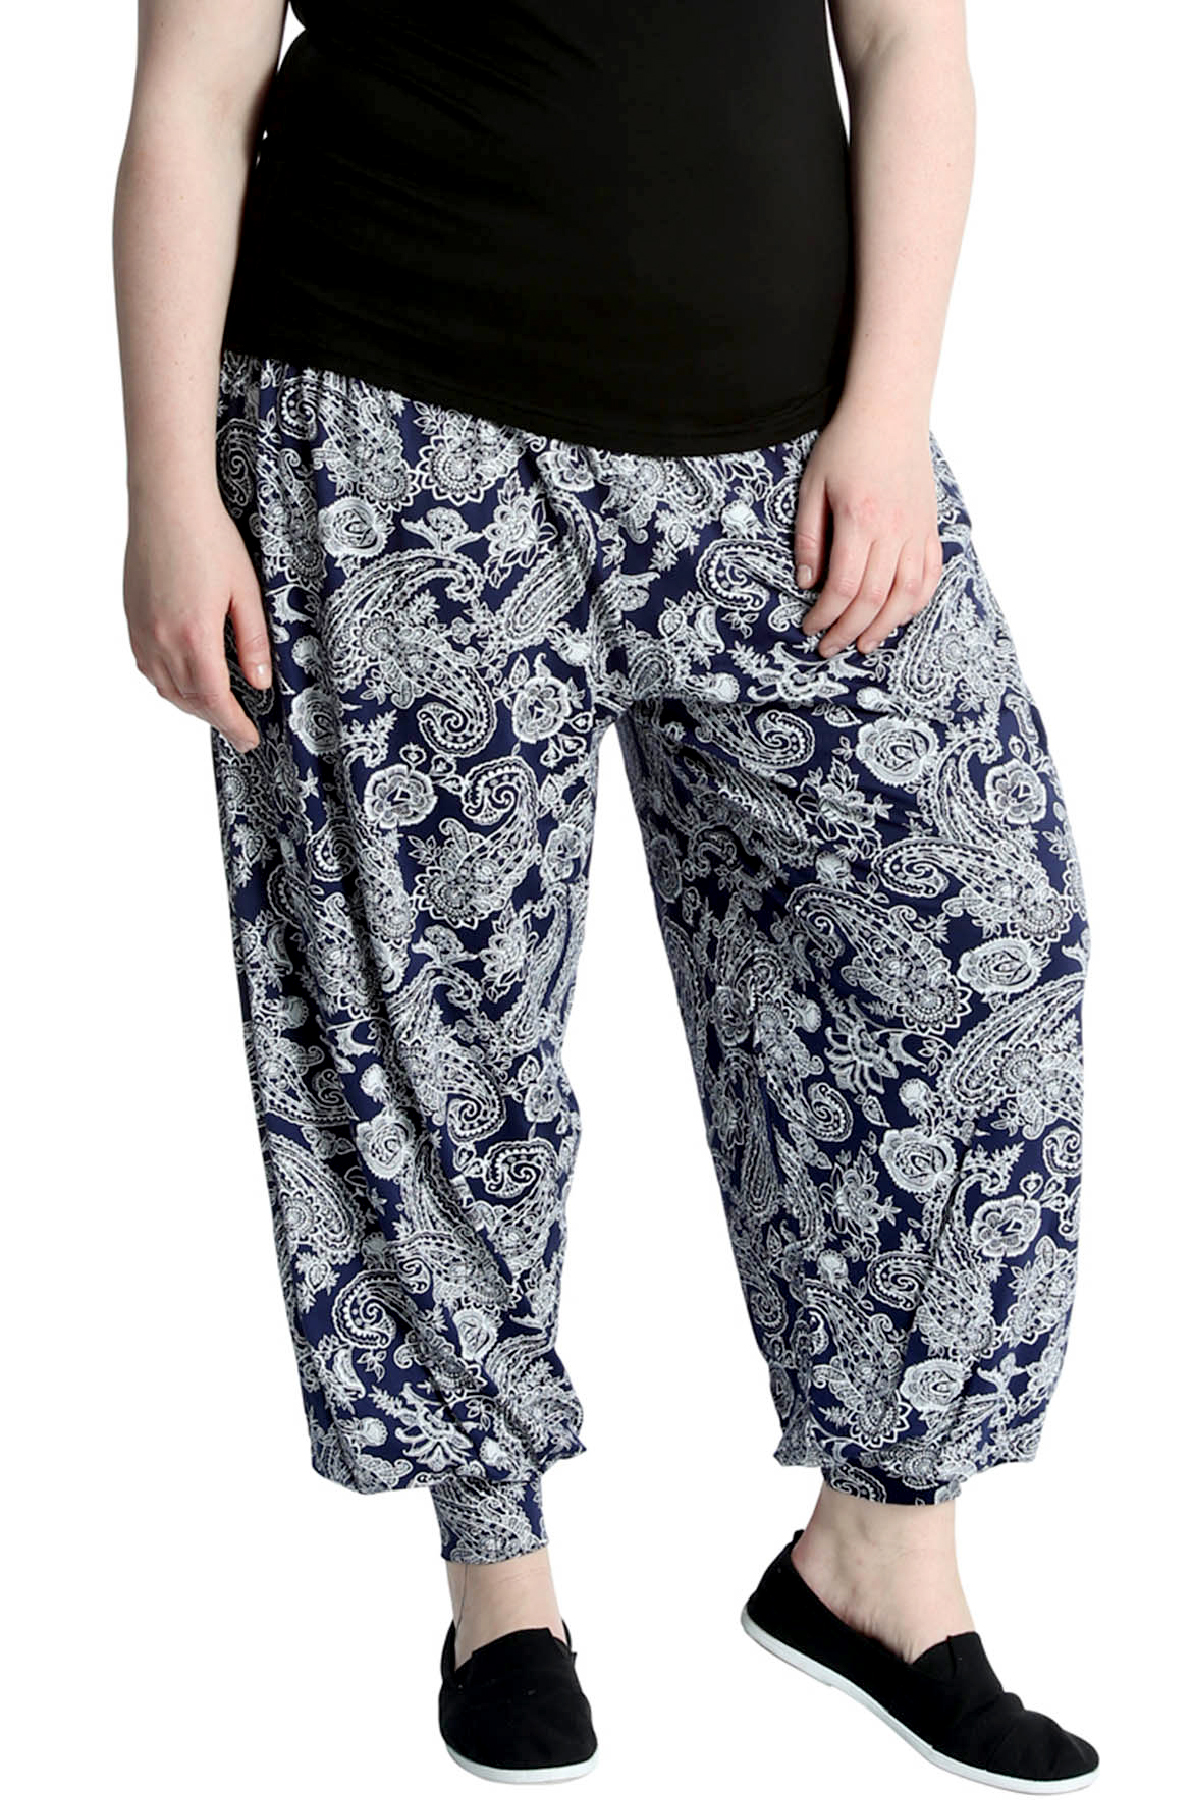 61af79e92d4 Details about New Womens Paisley Print Plus Size Ladies Harem Ali Baba  Trouser Cuffed Nouvelle